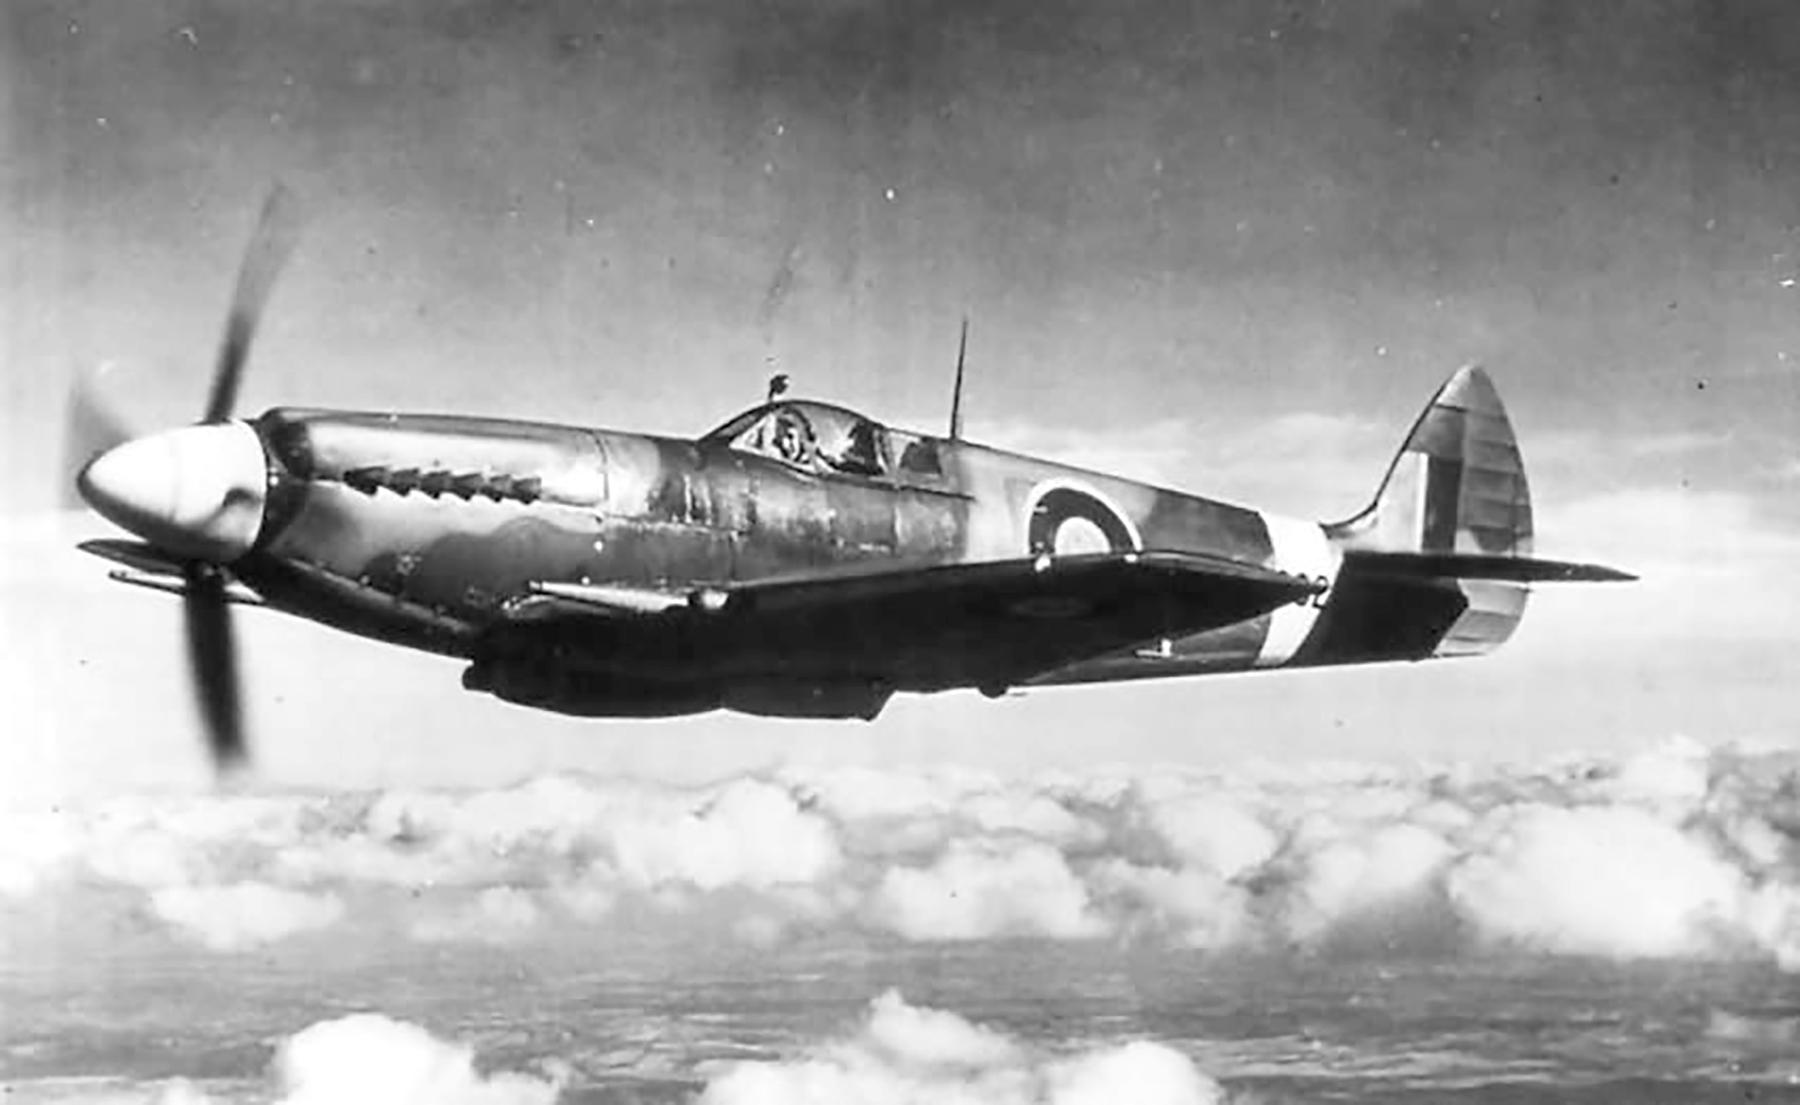 Spitfire XII RAF 41Sqn EBB Don Smith MB882 Tangmere 1943 05